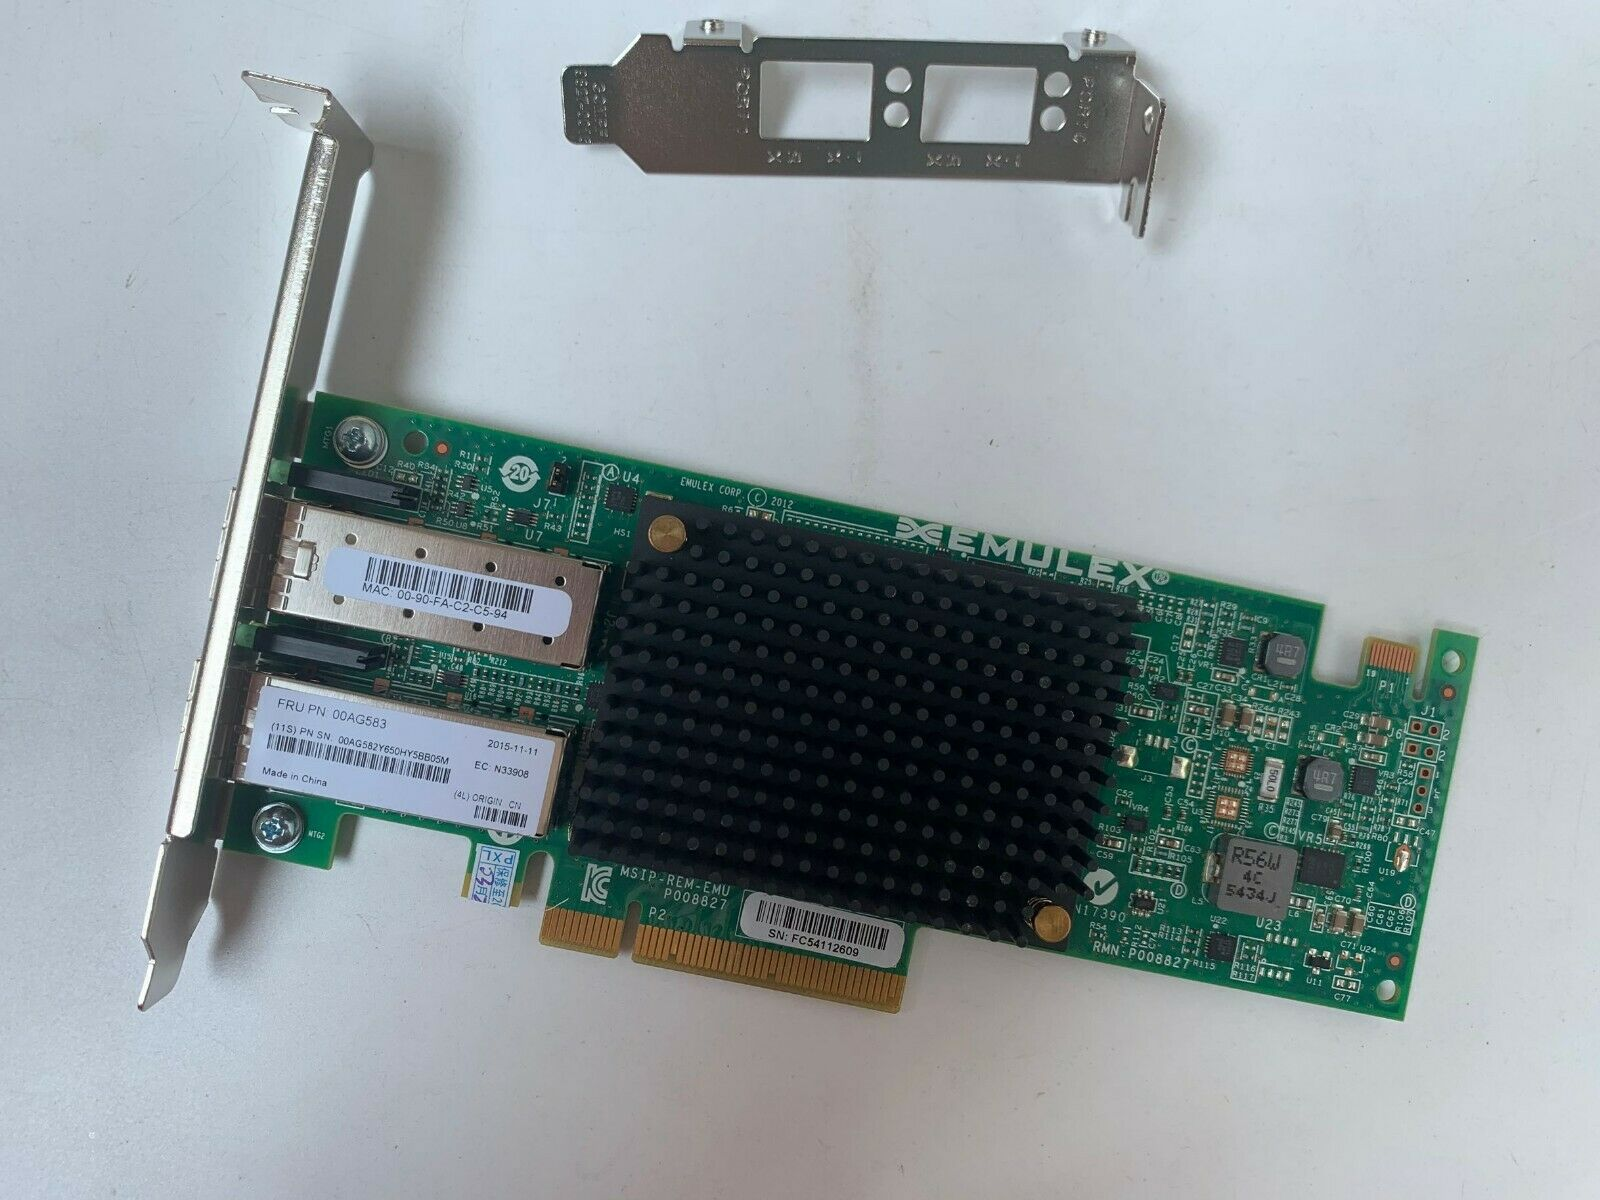 00AG583 IBM Emulex P008827 2-Port 10Gbps SFP+ PCIe Network Adapter